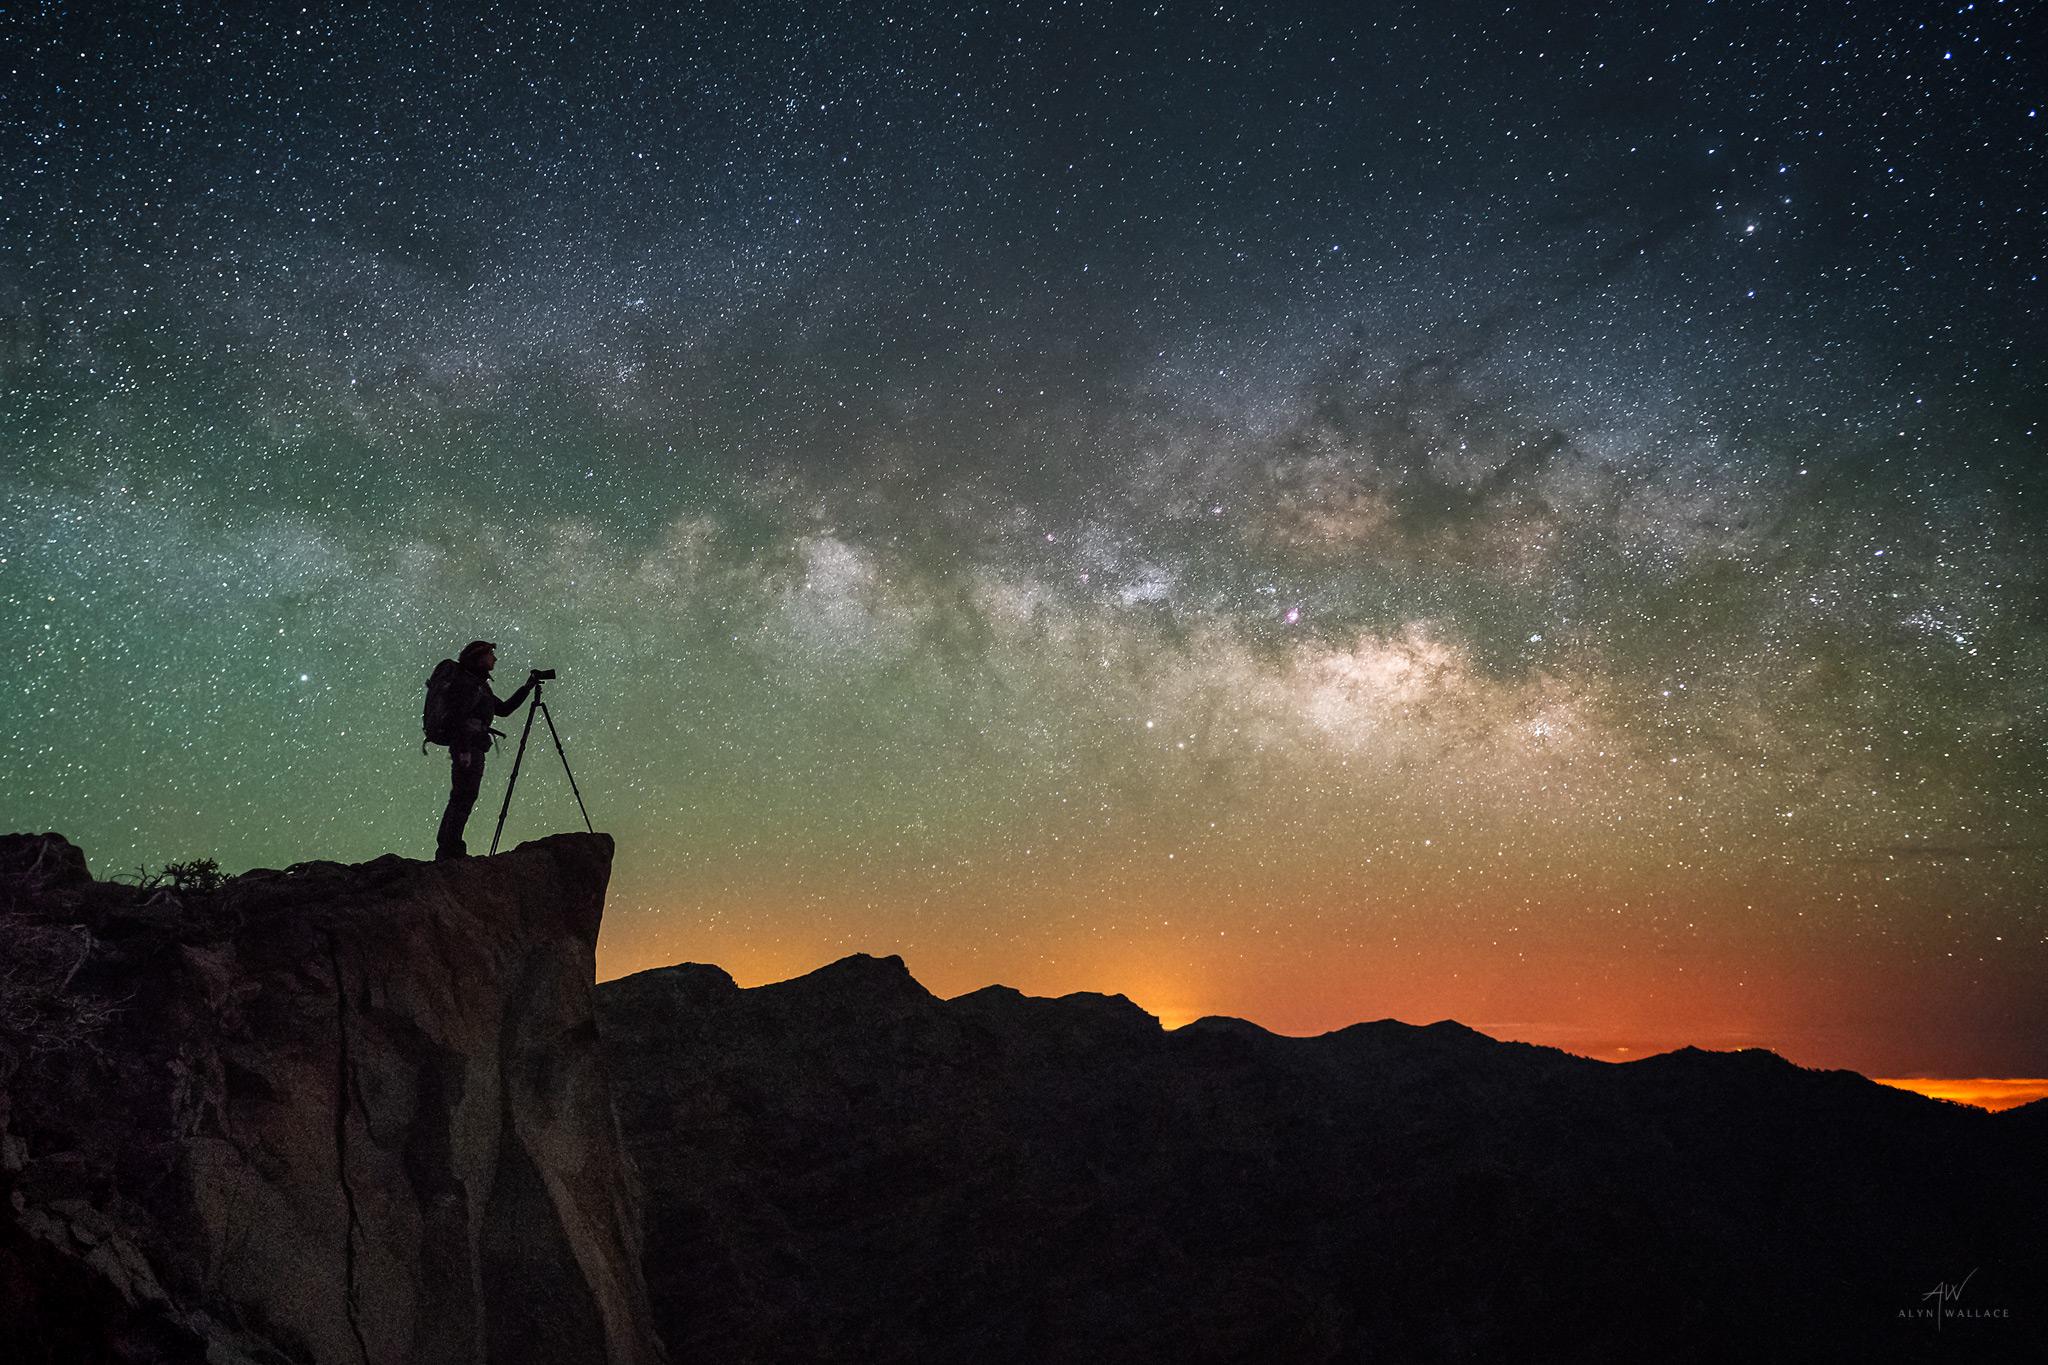 Galaxy-Edge-La-Palma-Astrophotography.jpg